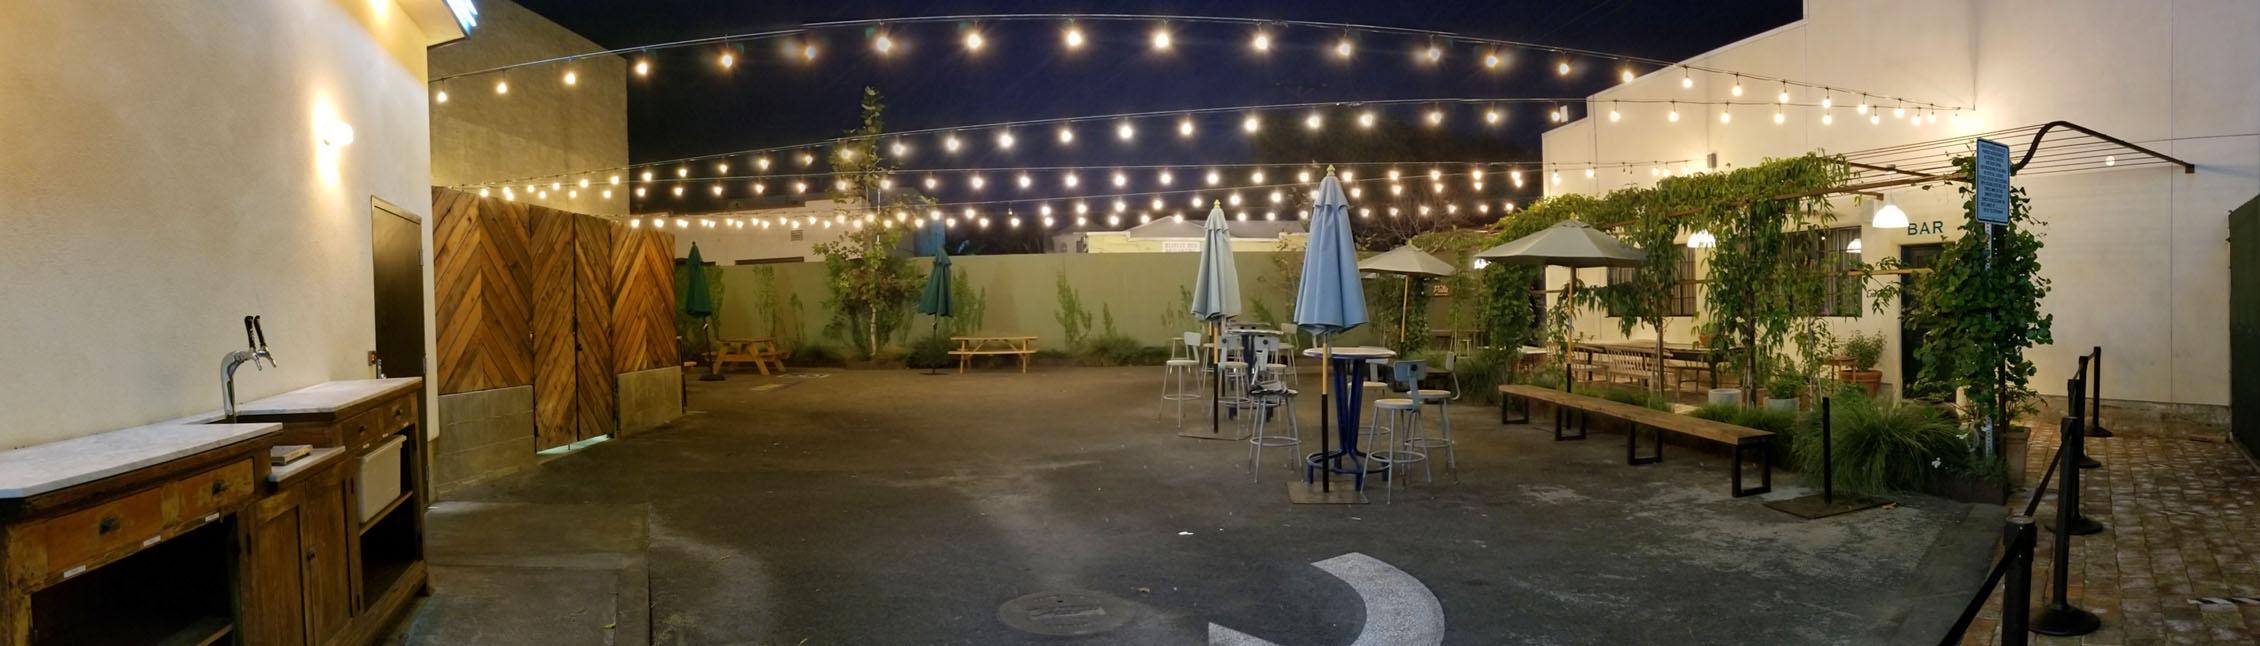 Johnny's West Adams Outdoor Seating Area